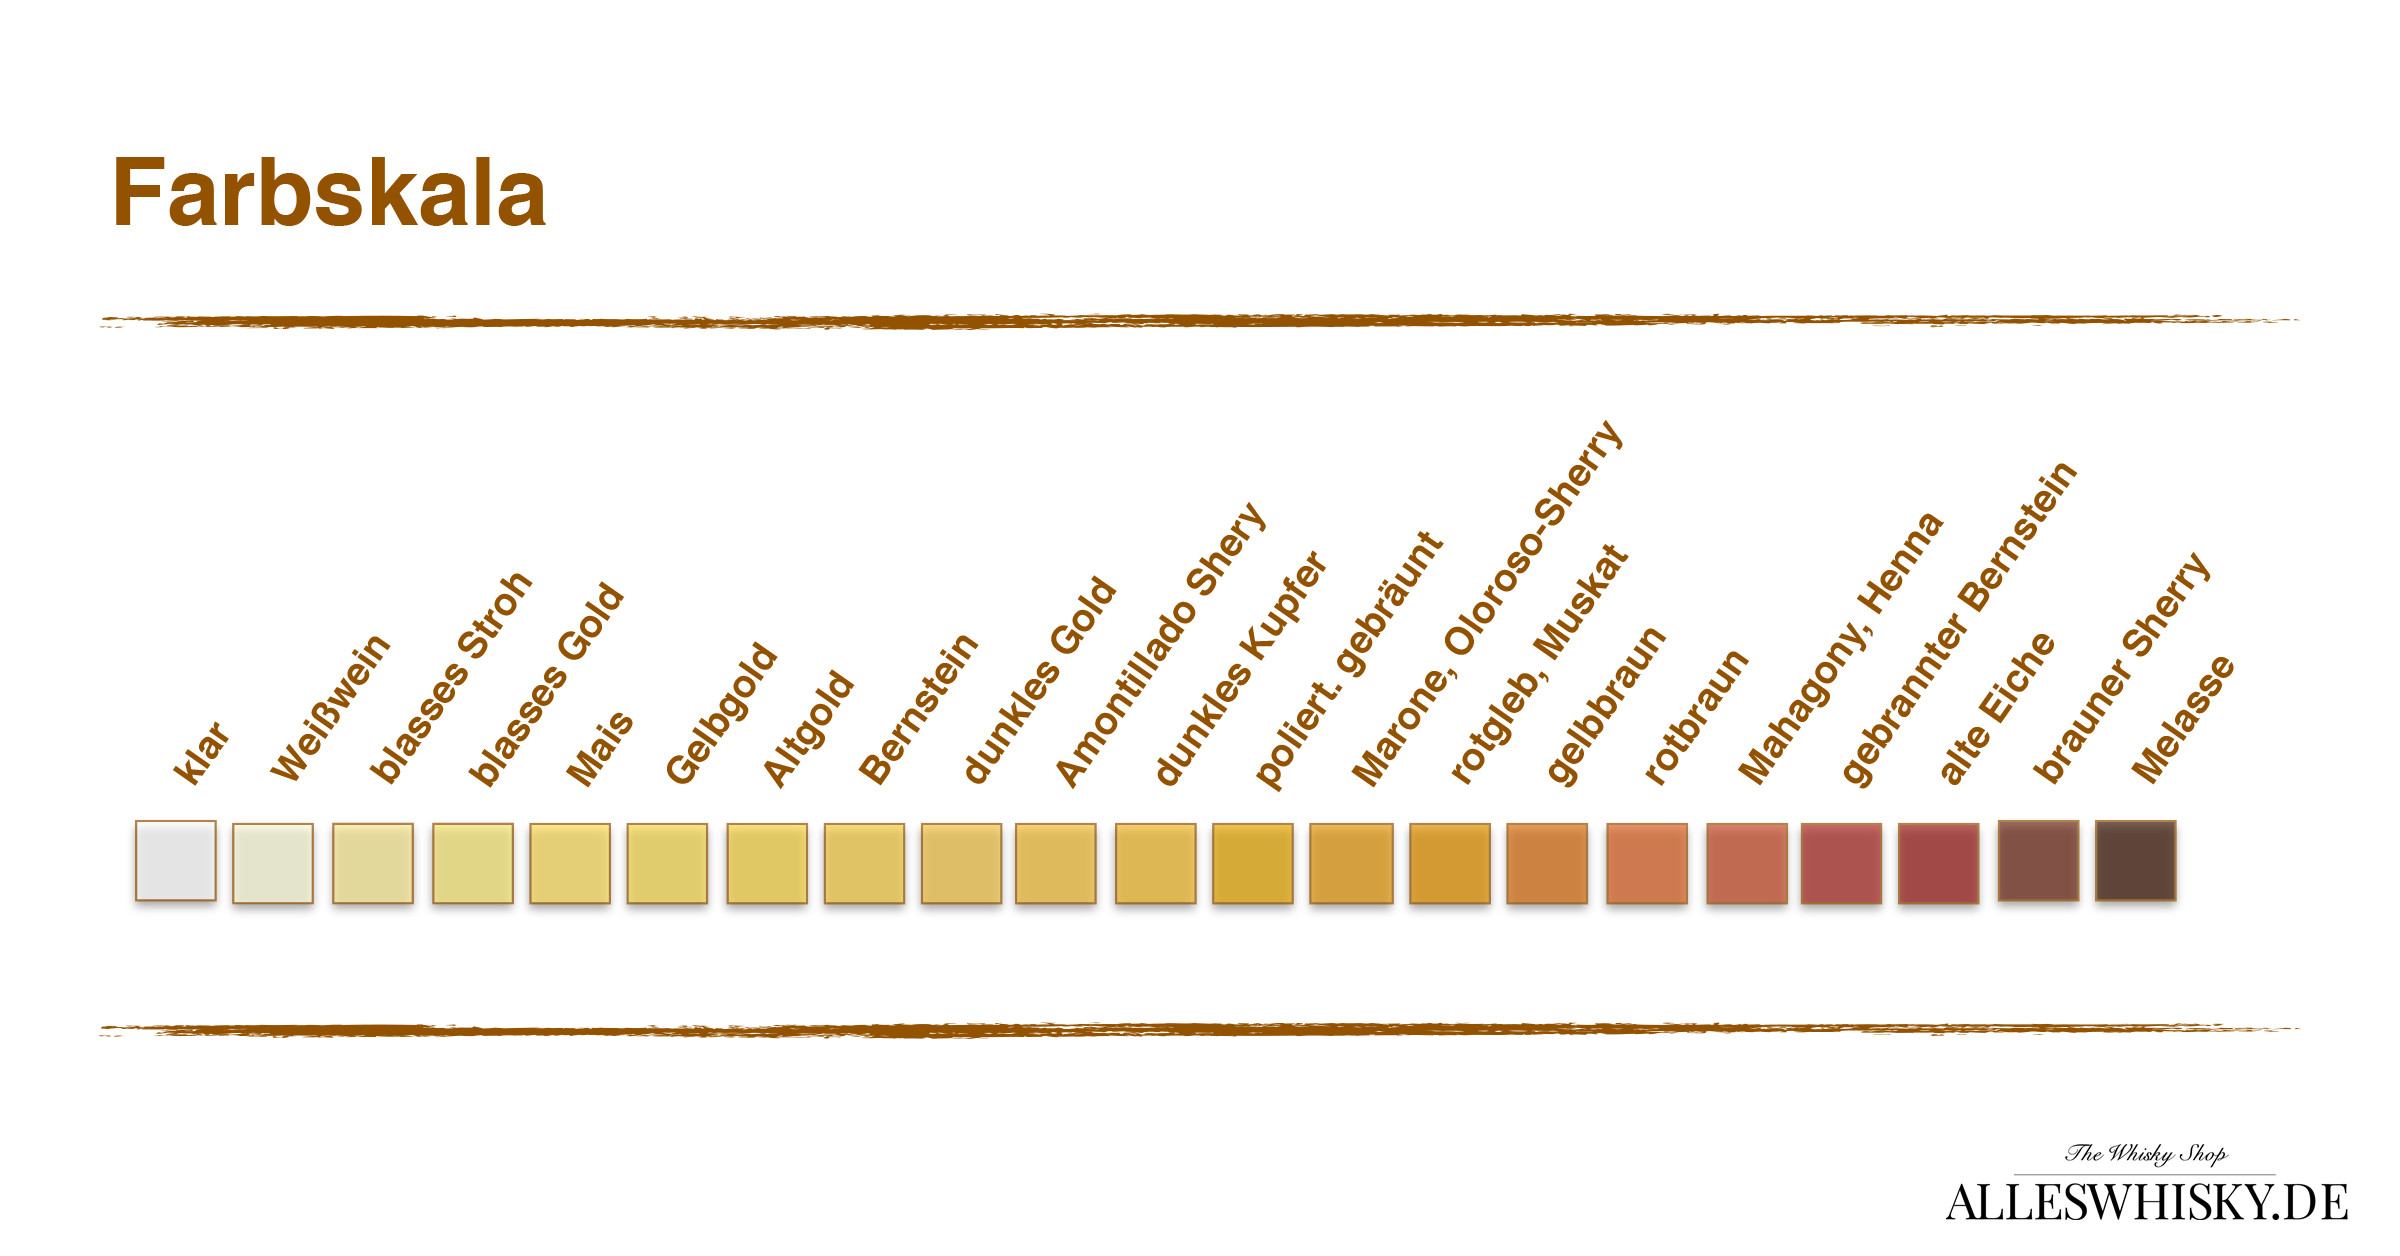 Fortlaufende Farbskala von reifenden Spirituosen